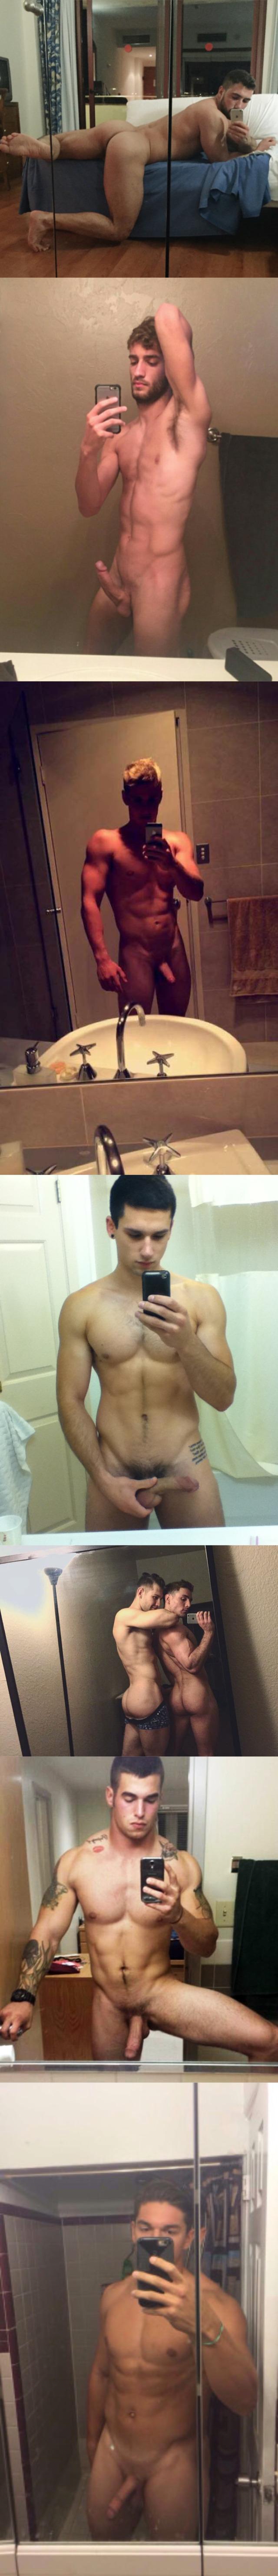 amateur guy naked selfies dicks asses